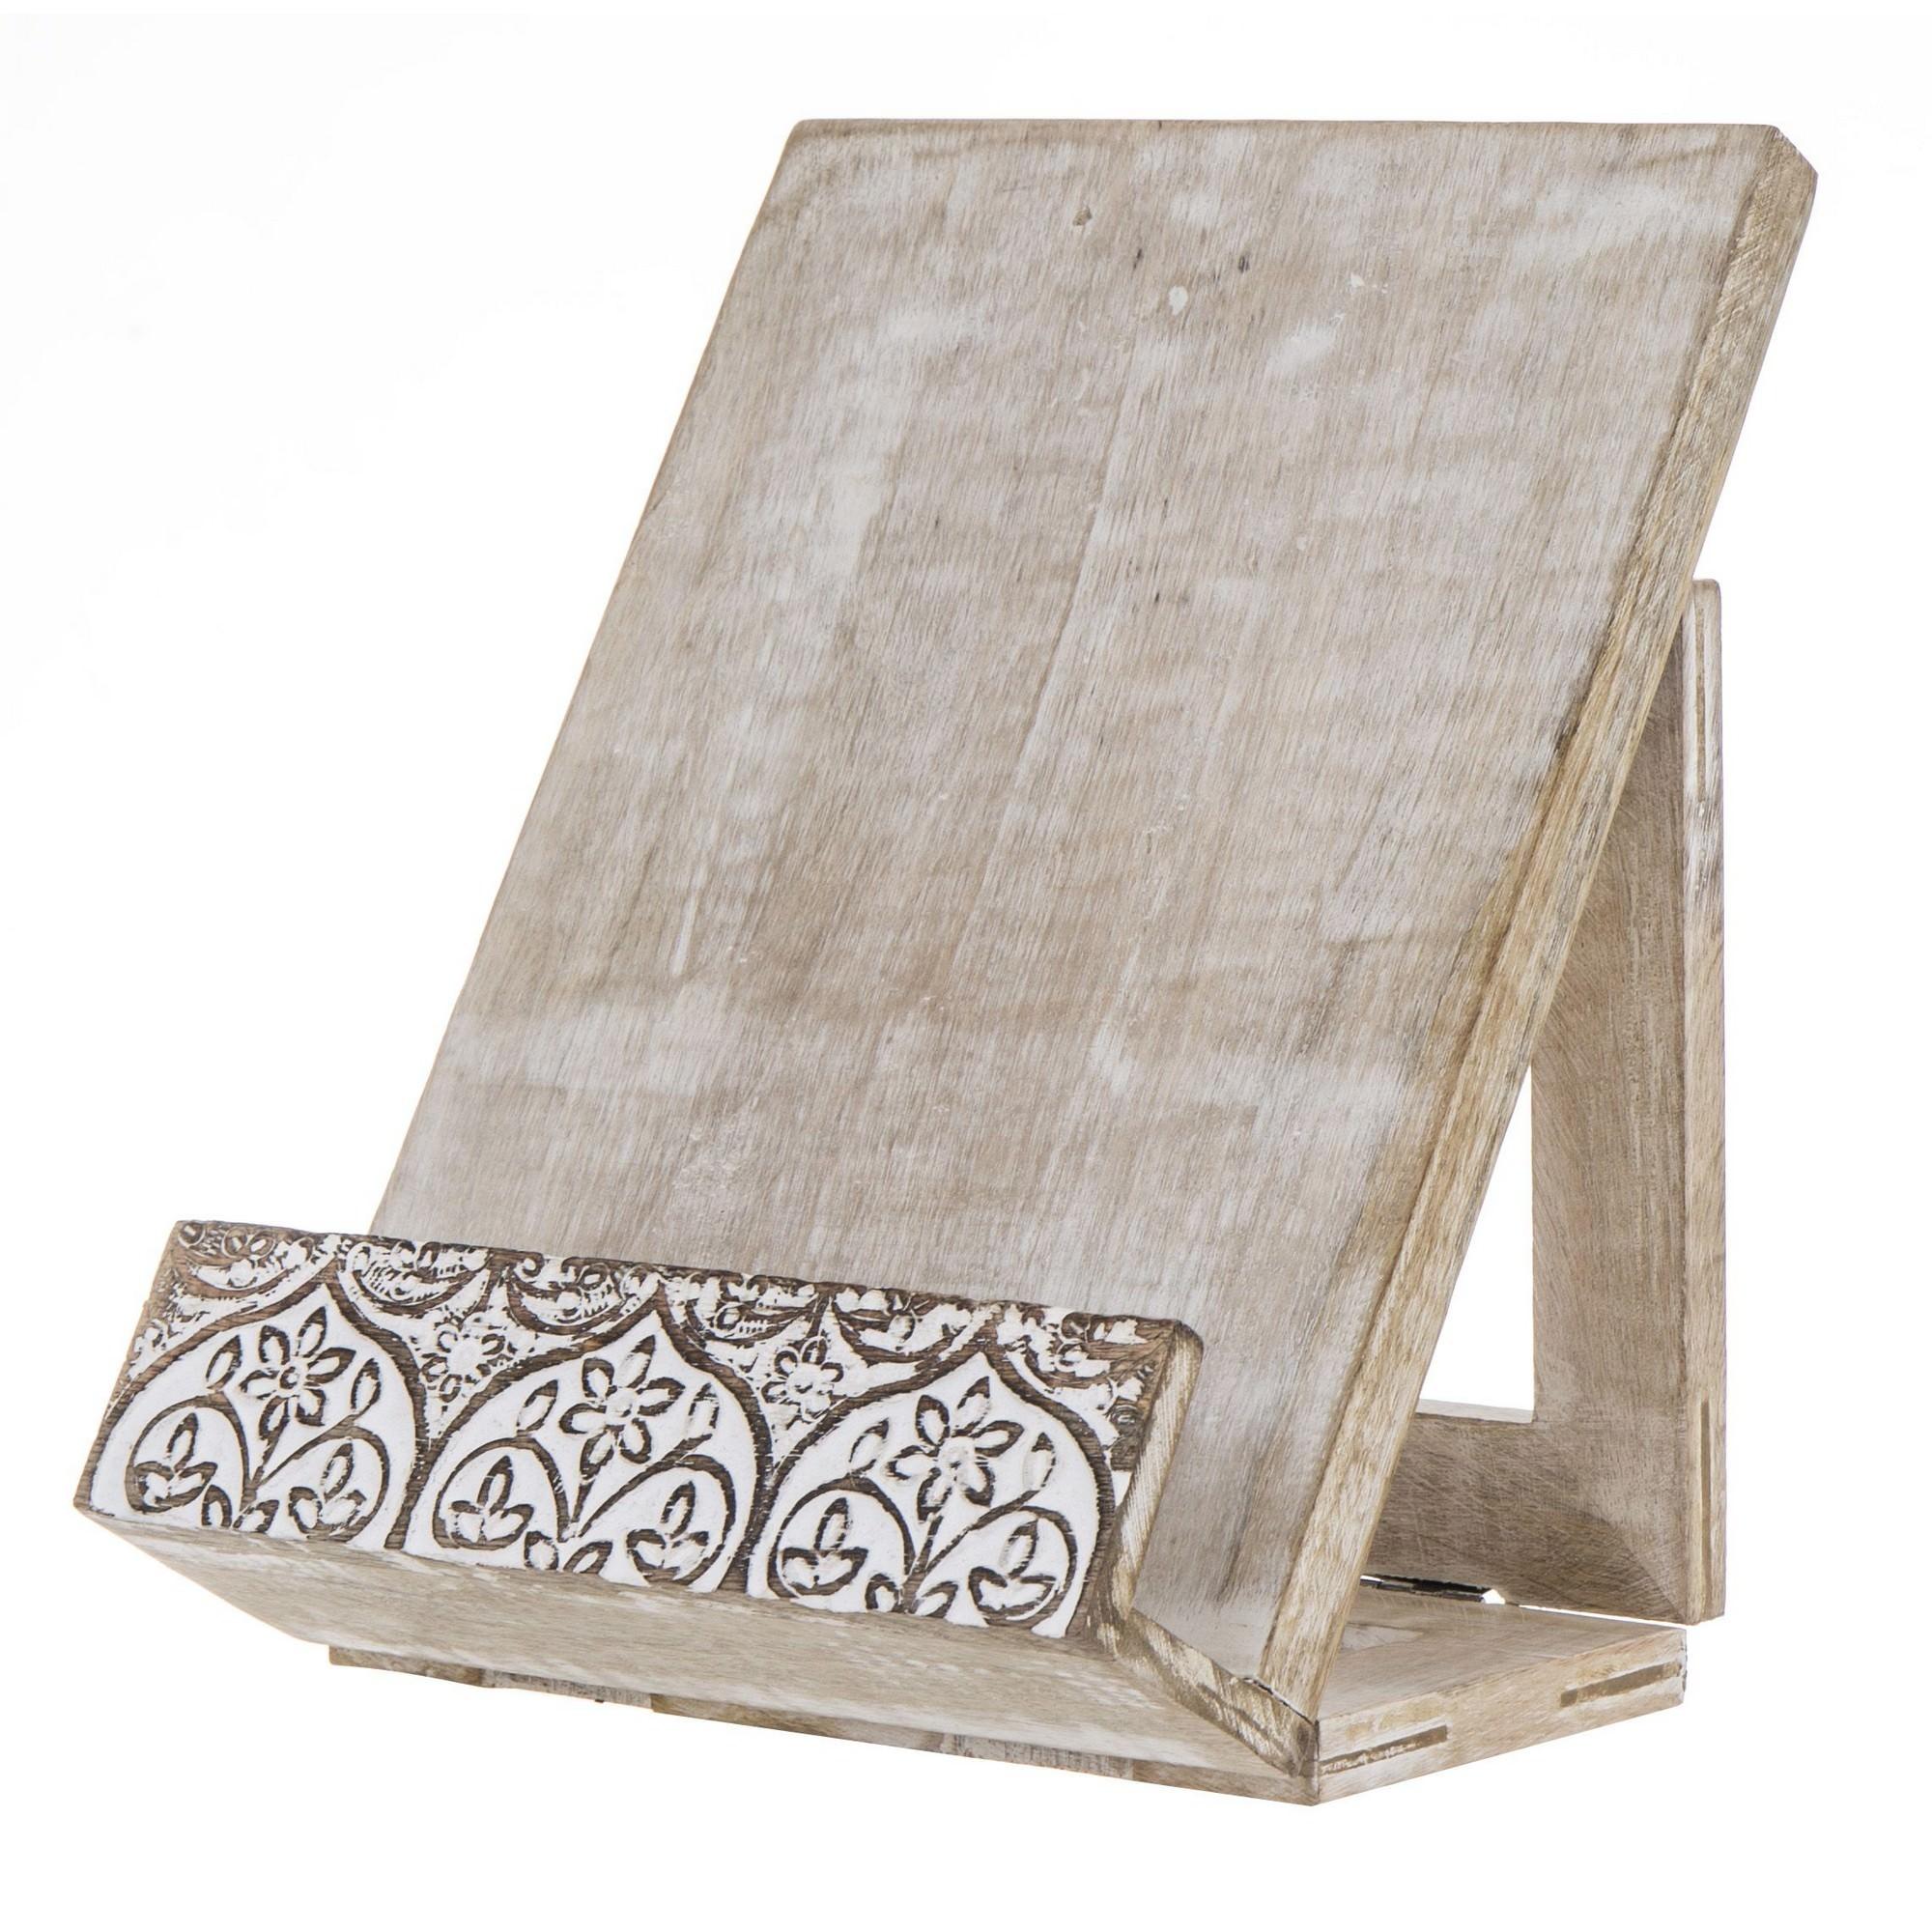 Adora Mango Wood Recipe Book Holder